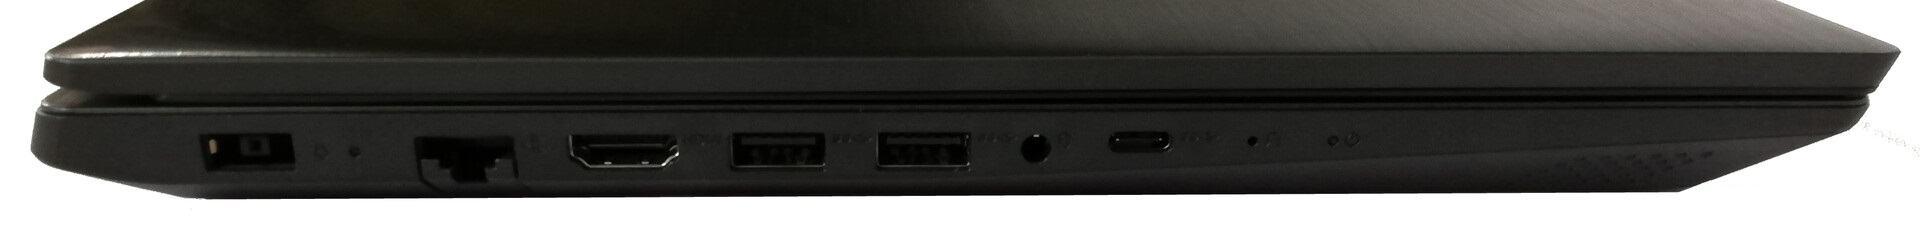 Lenovo Ideapad L340-15IRH